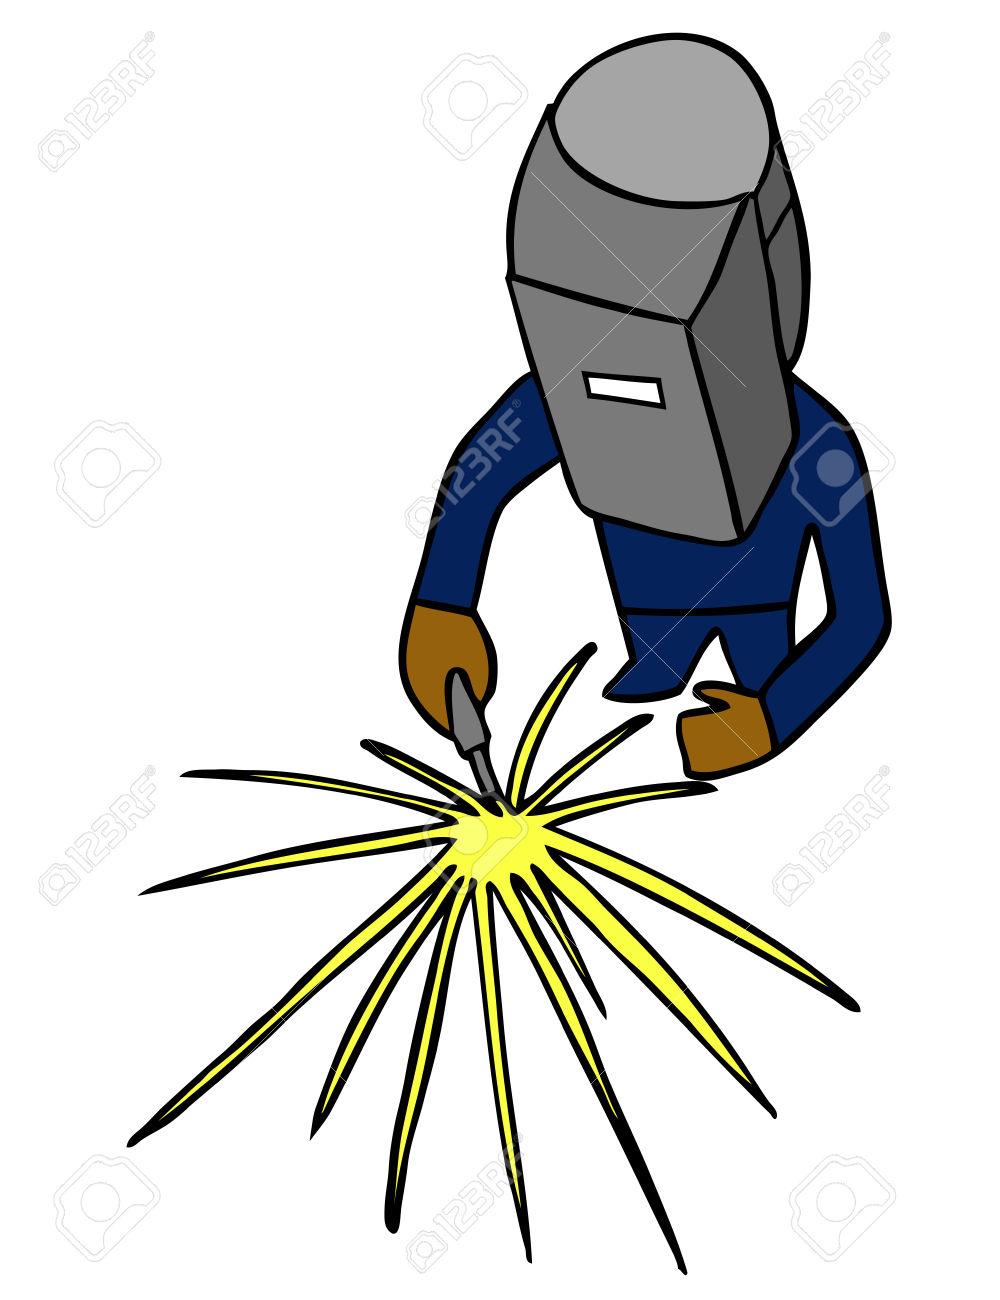 1000x1300 Welding Clipart Welding Sparks